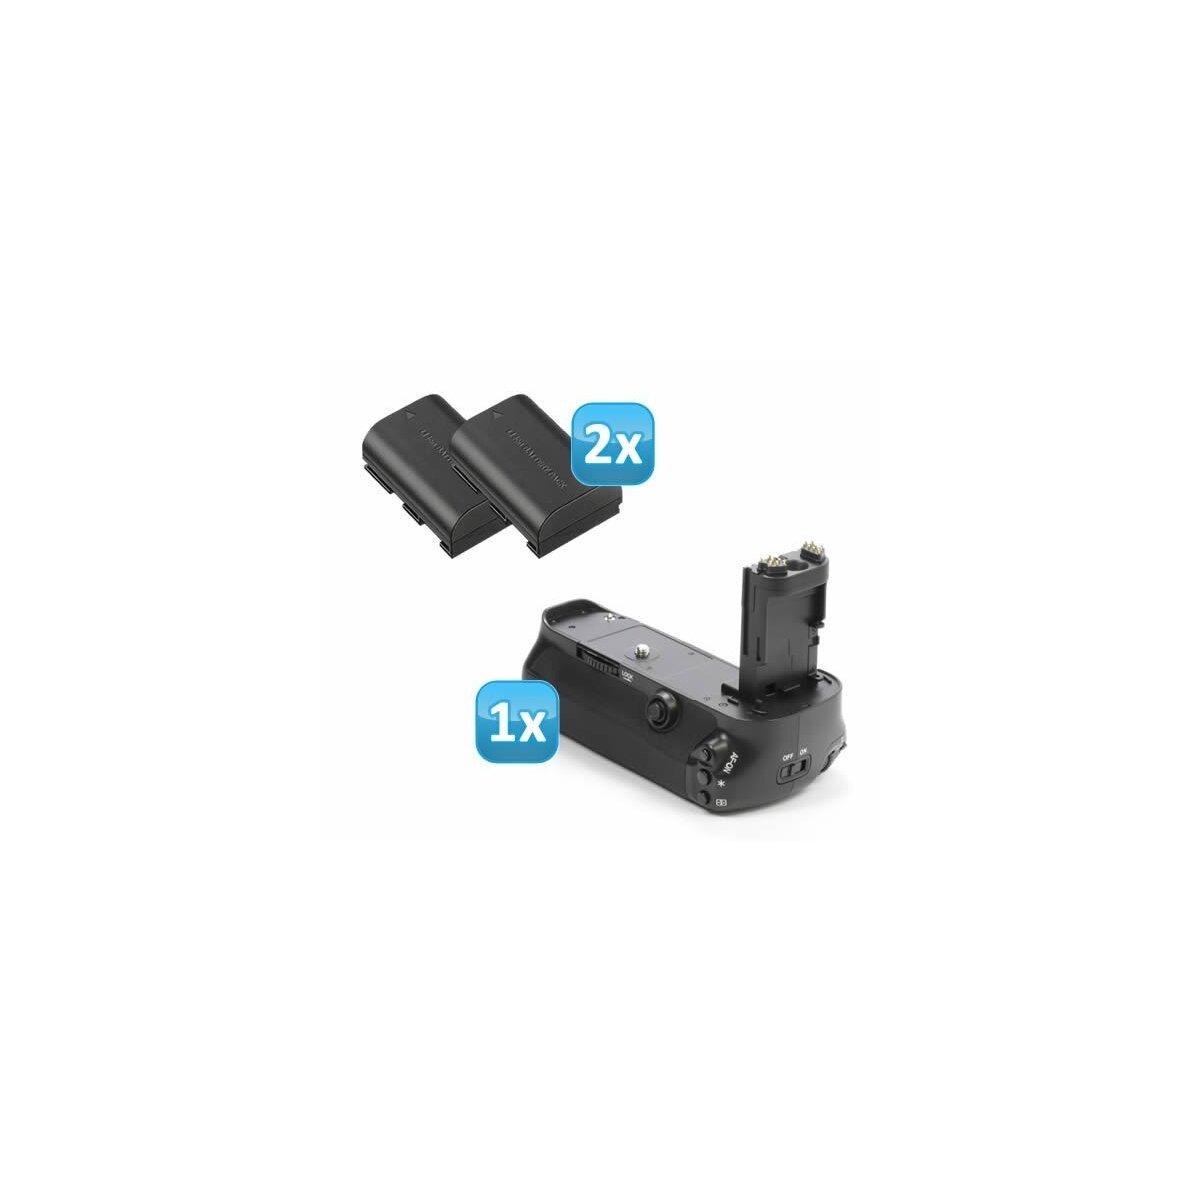 Profi Batteriegriff kompatibel mit Canon EOS 5D Mark III Ersatz für BG-E11  + 2x LP-E6 Nachbau-Akkus